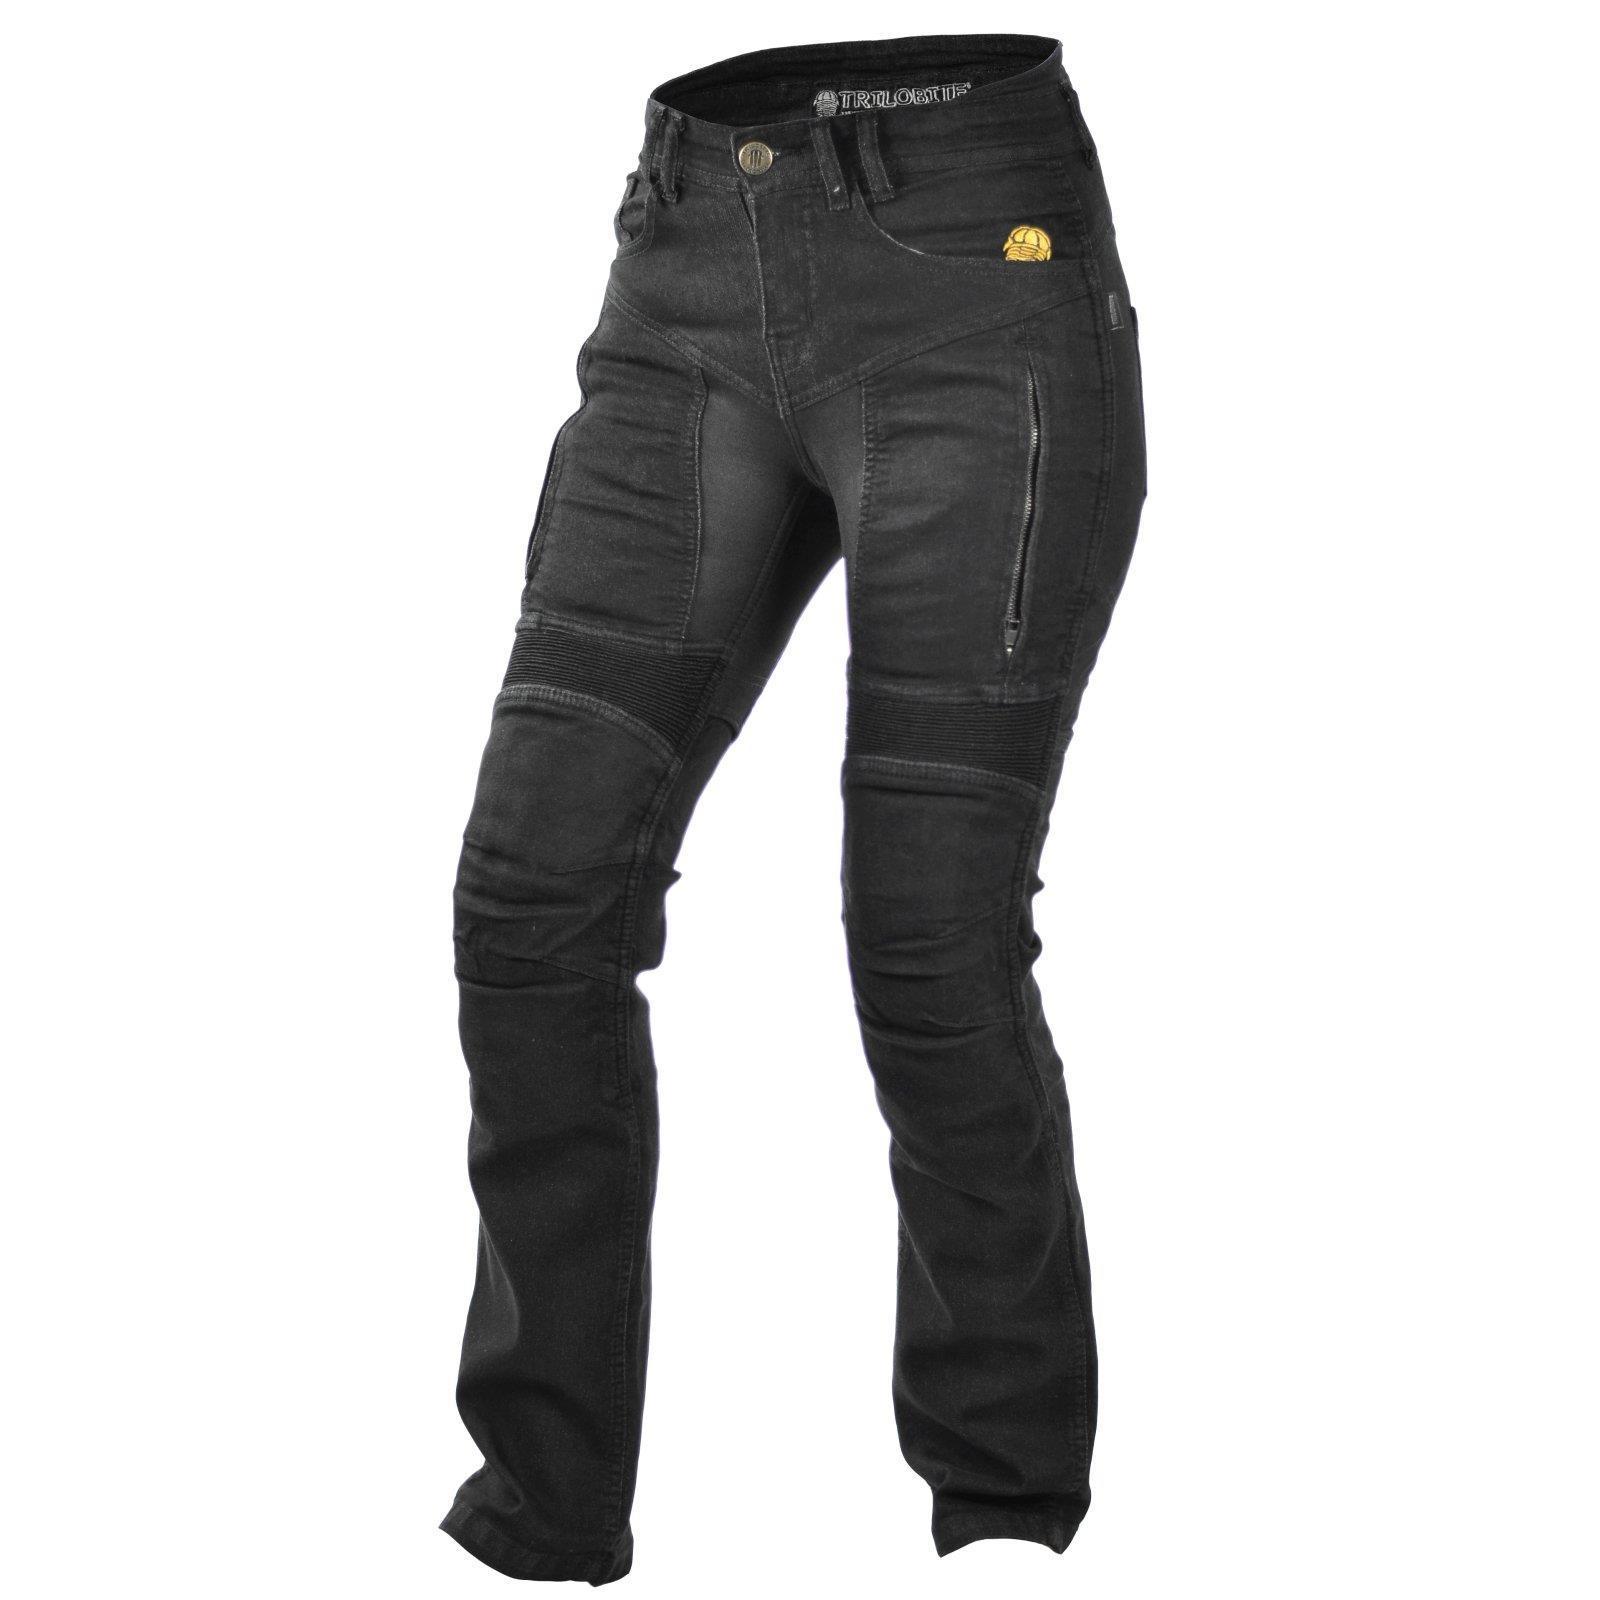 Trilobite-Pantaloni-Moto-Jeans-Abbigliamento-Parado-MICAS-URBAN-DUAL-PANTS-ACID miniatura 75